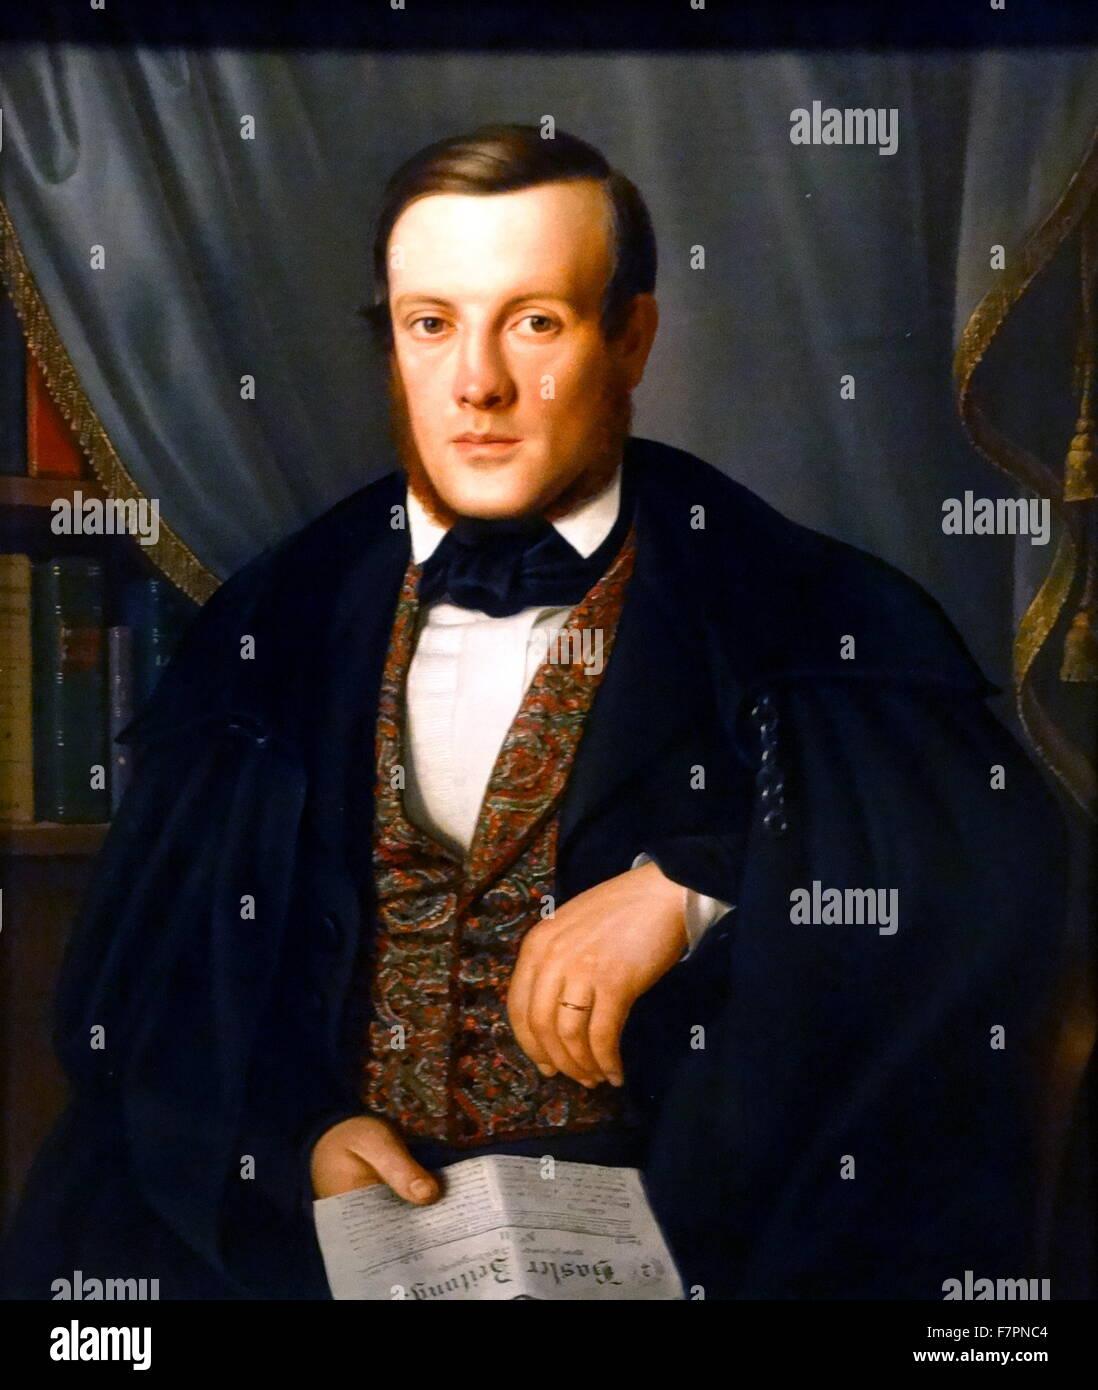 Louis de Wette, Physician of Basel' by Frau de Wette, 1843. German, oil on canvas. De Wette was medical officer - Stock Image